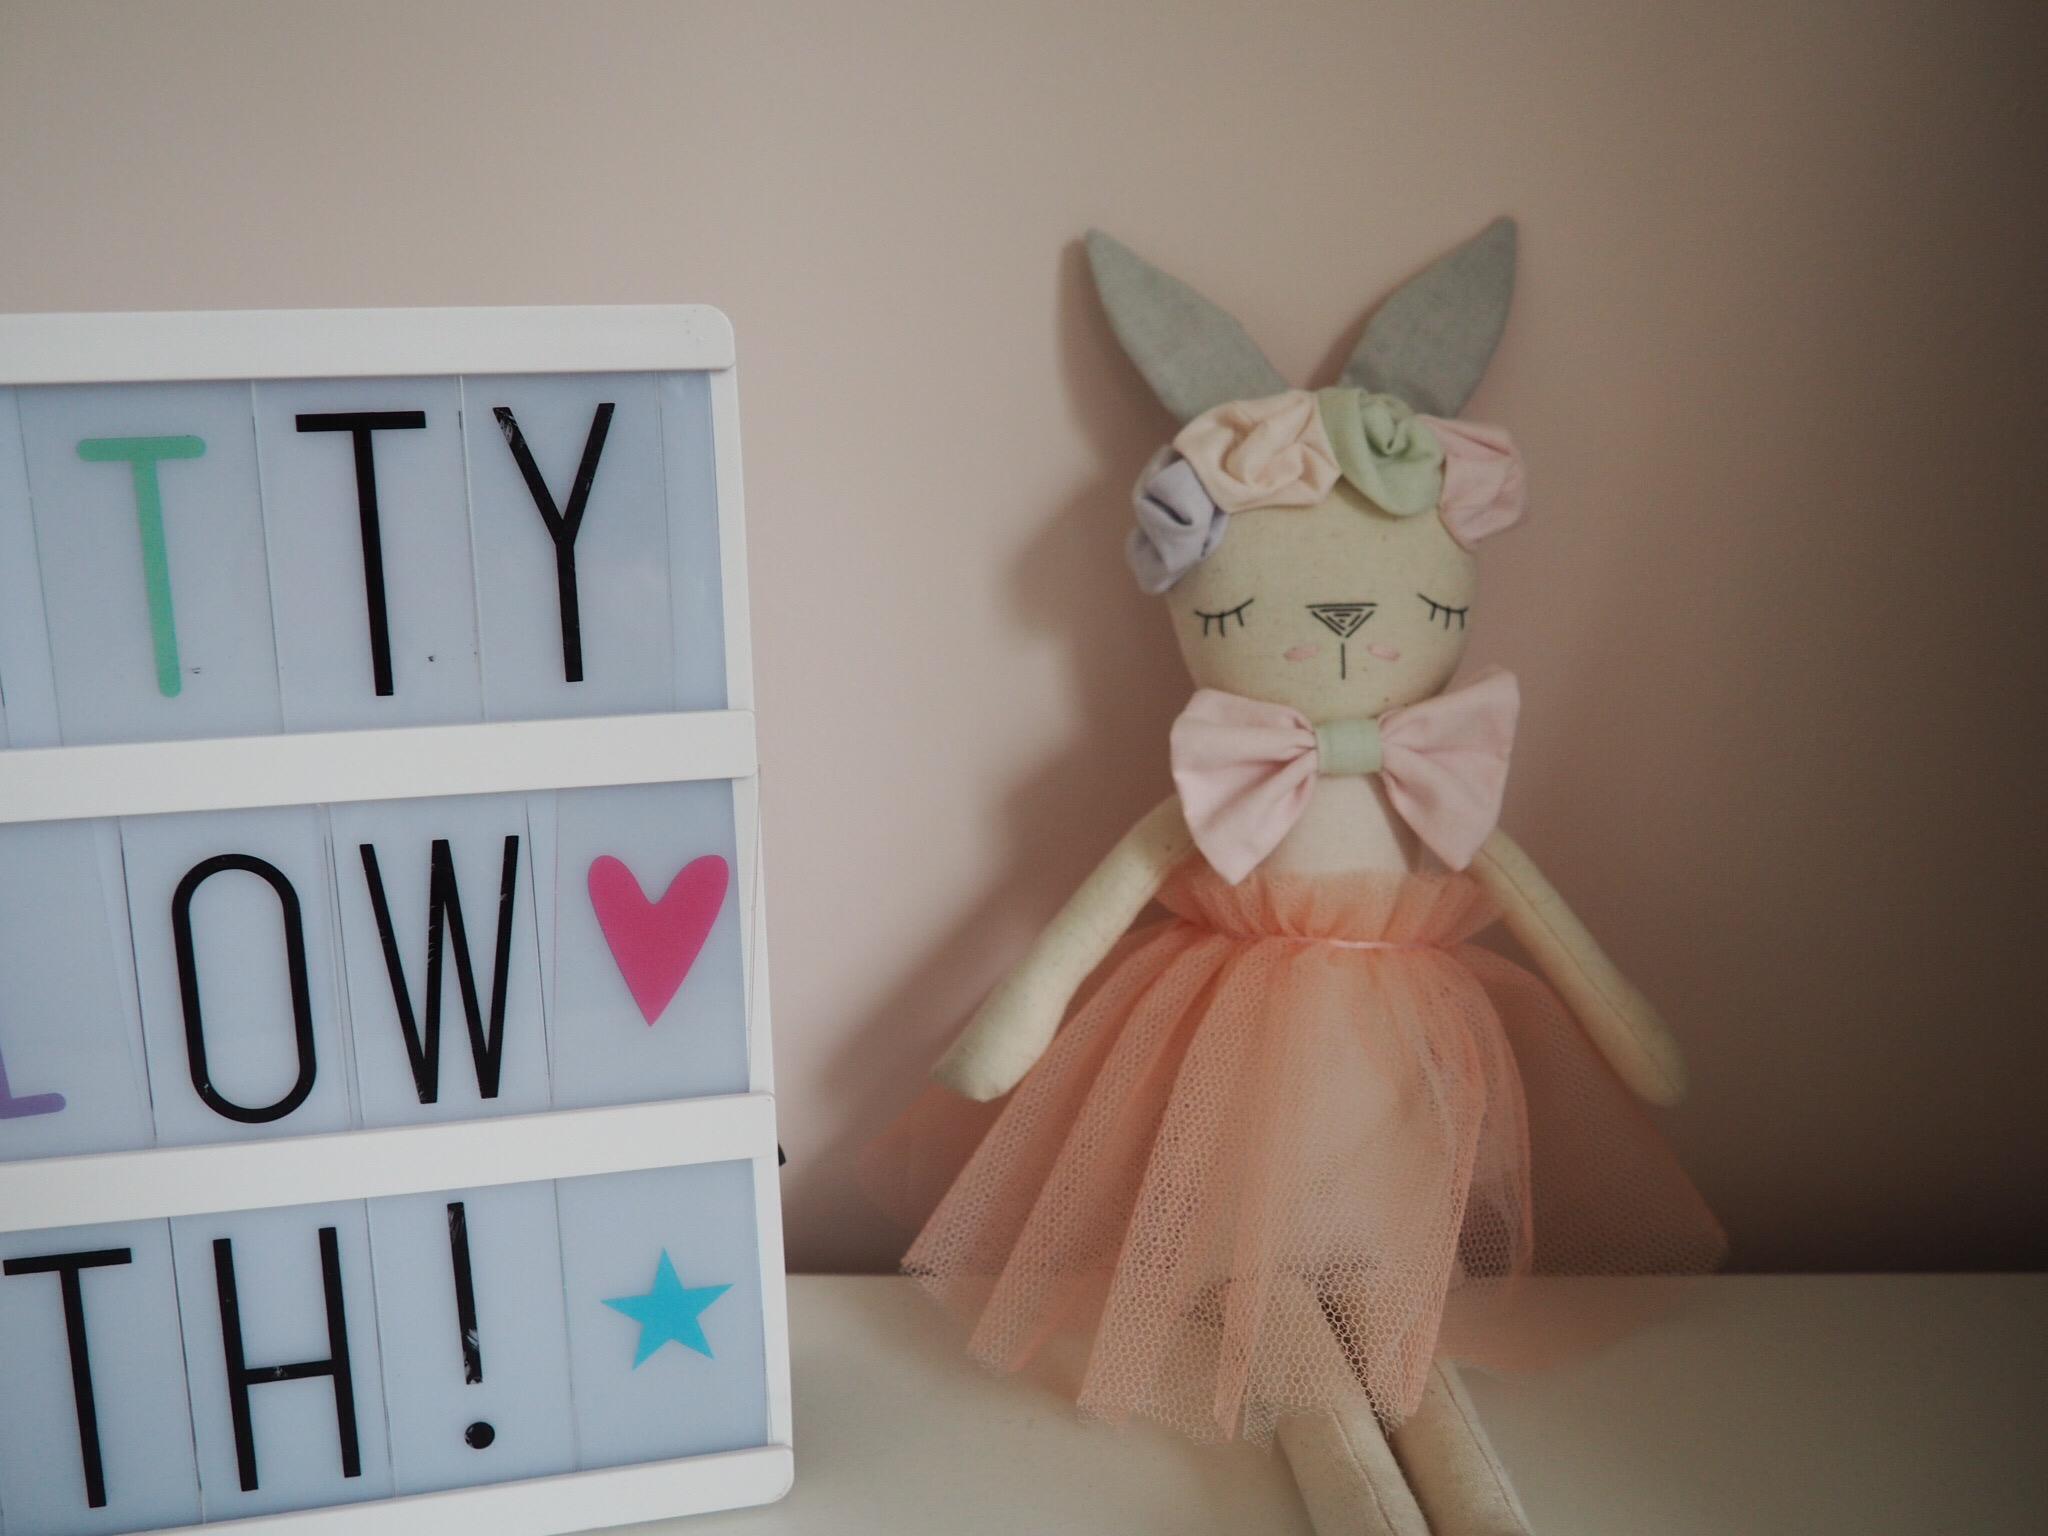 peach handmade bunny with grey ears and pink bow